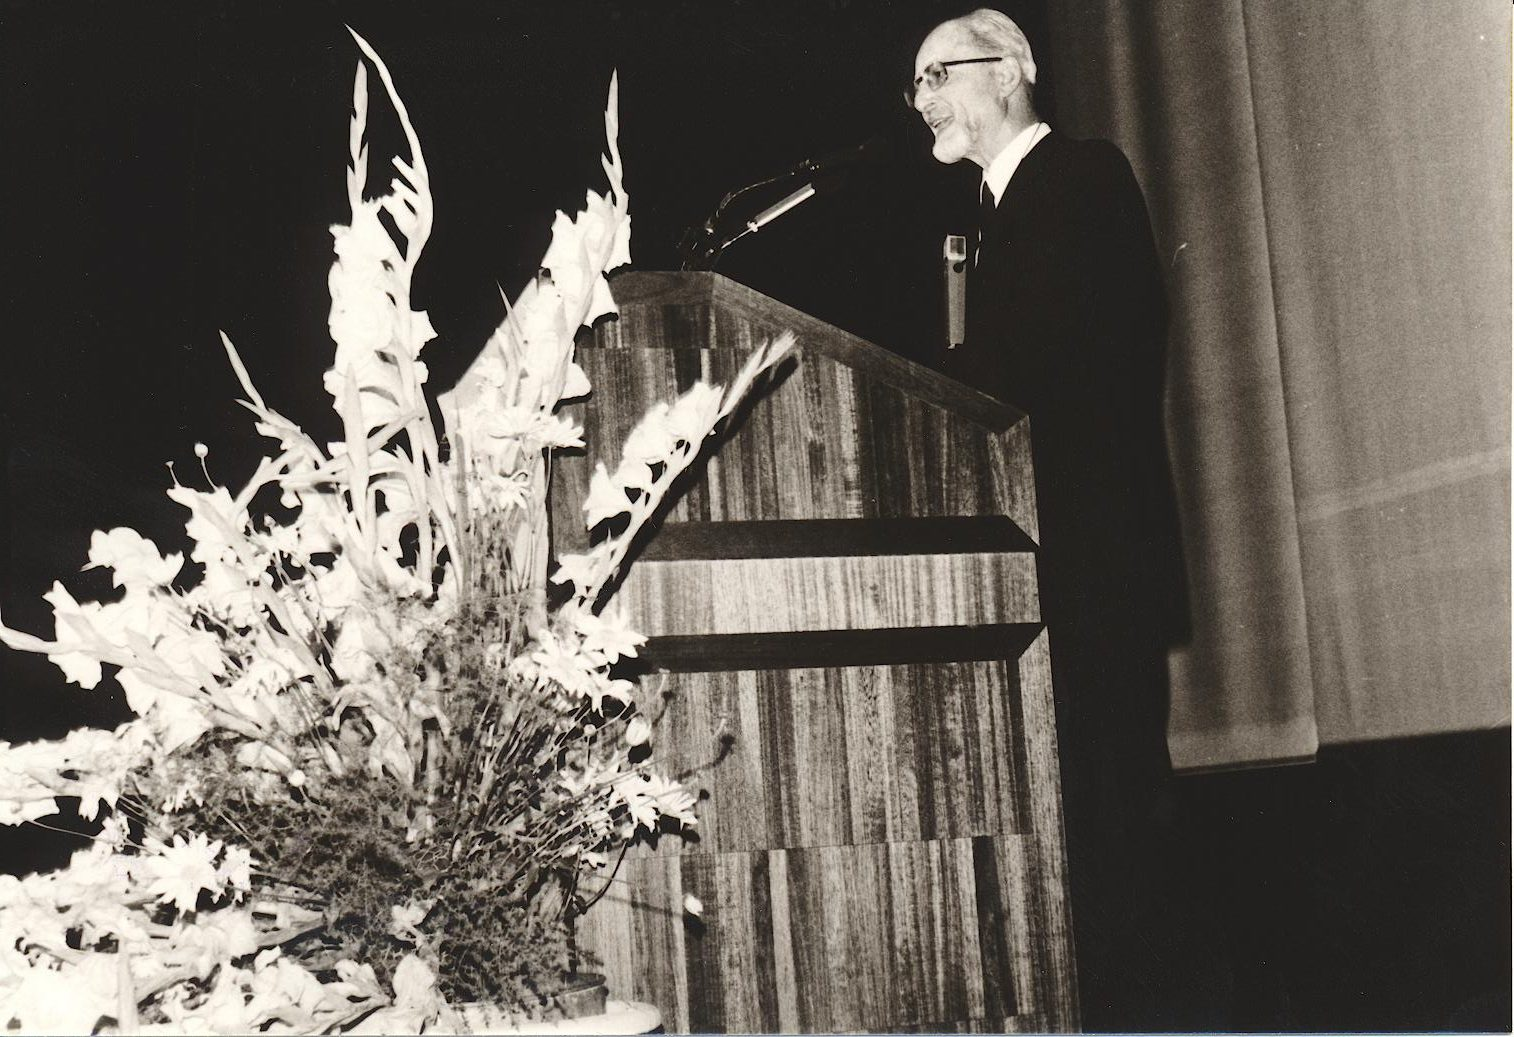 VIII. Internat. Imago Mundi-Kongress 1980, Innsbruck, Prof. DDr. Claus Schedl